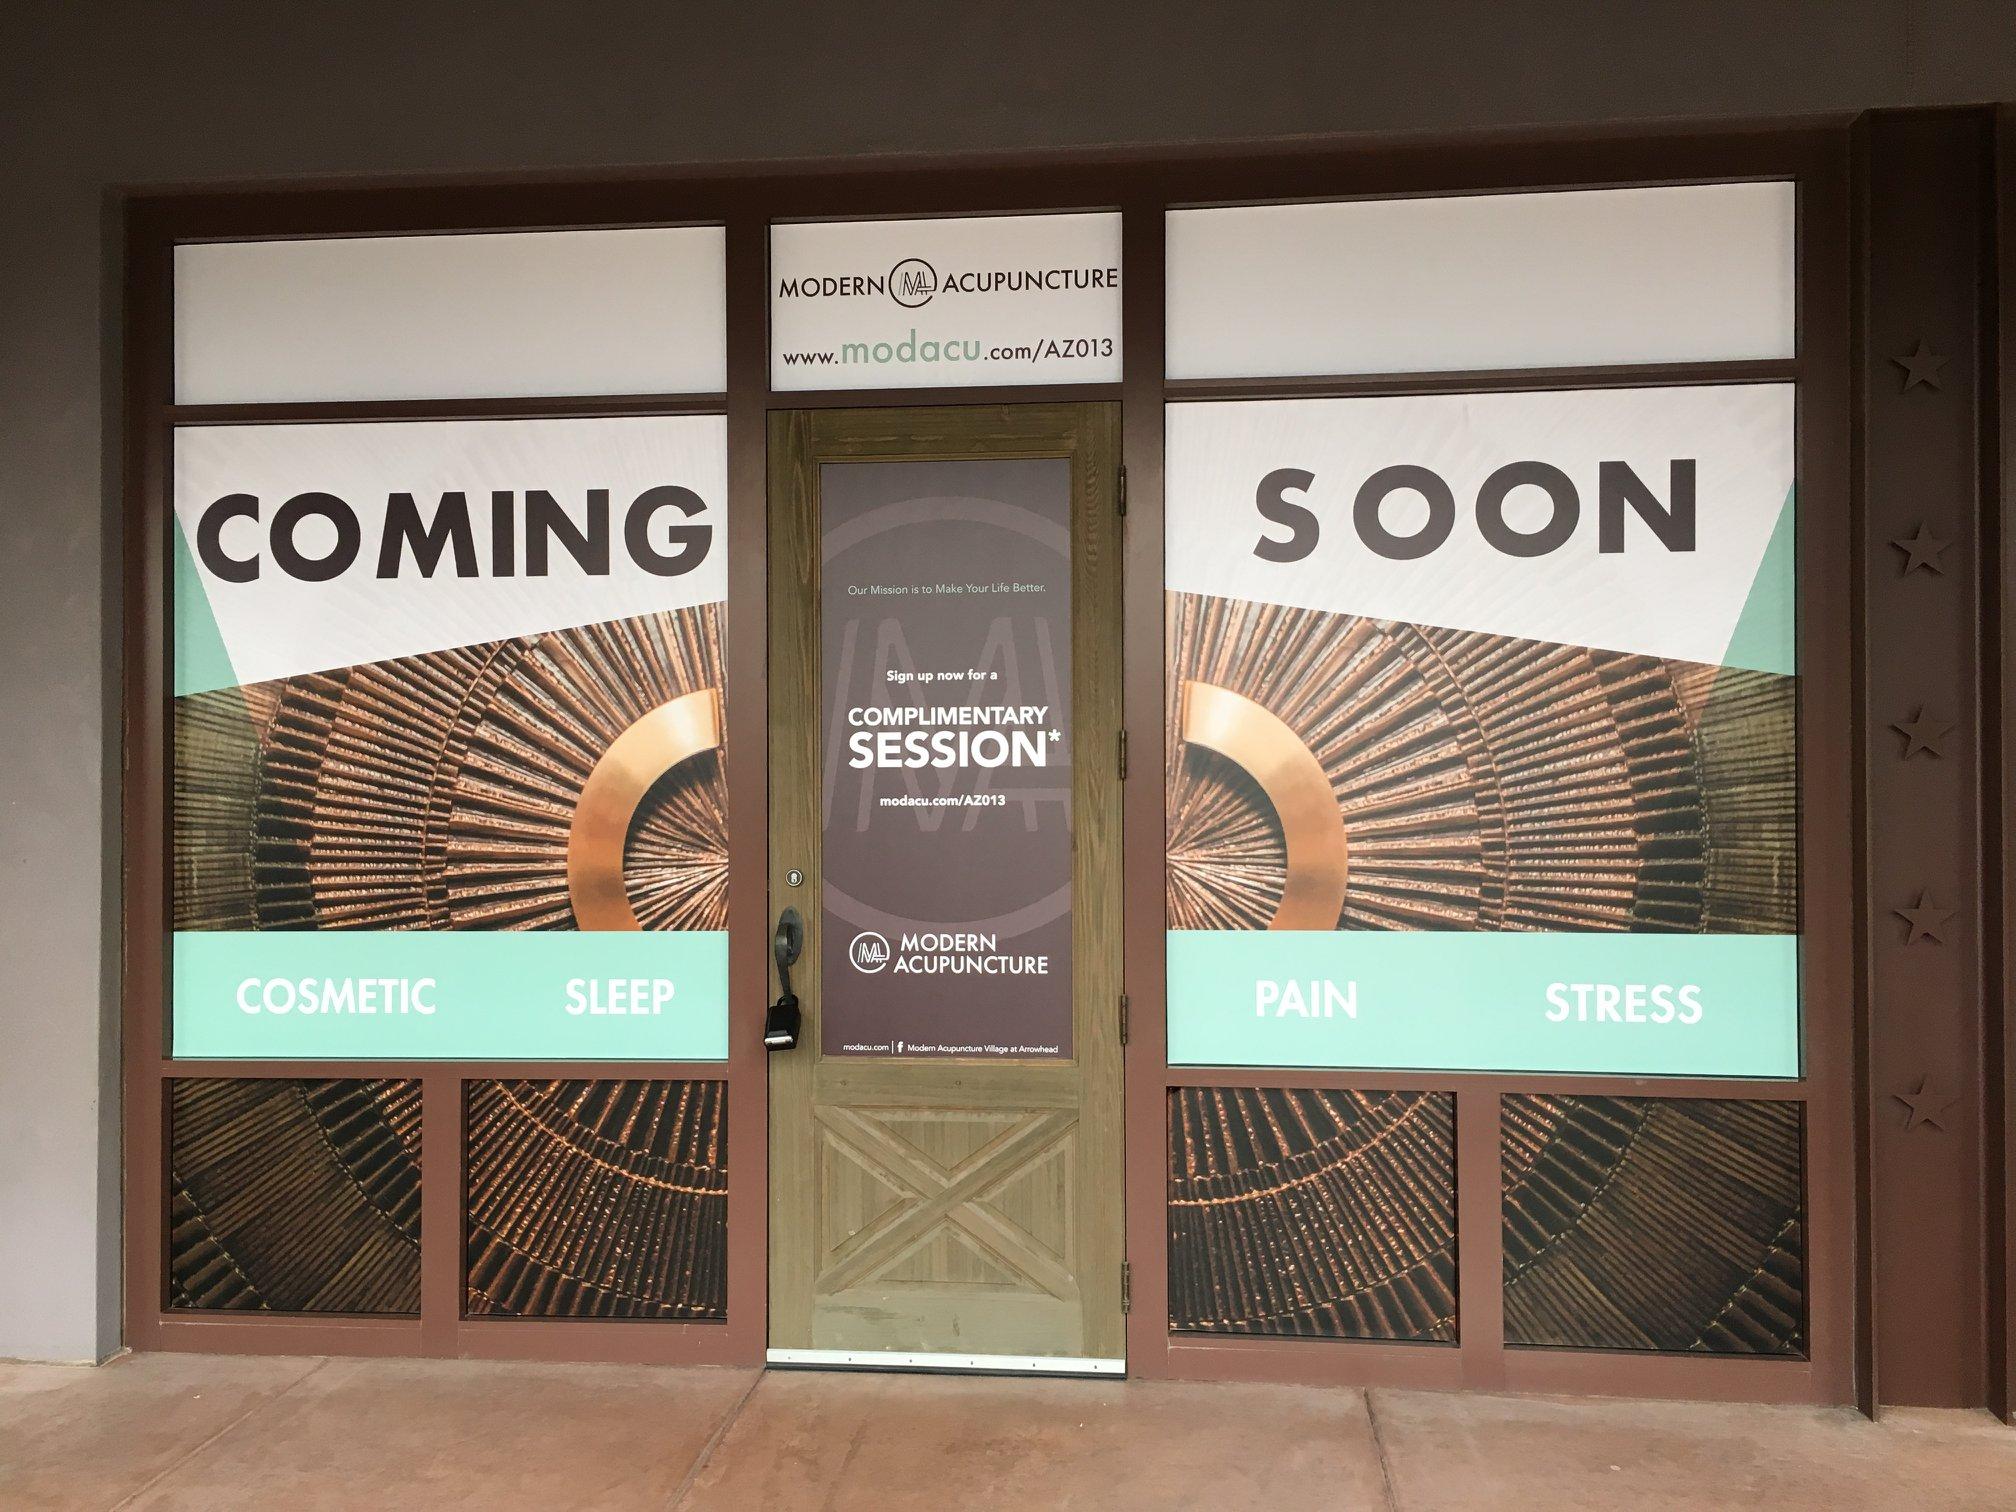 Modern Acupuncture Coming Soon Custom Window Wrap